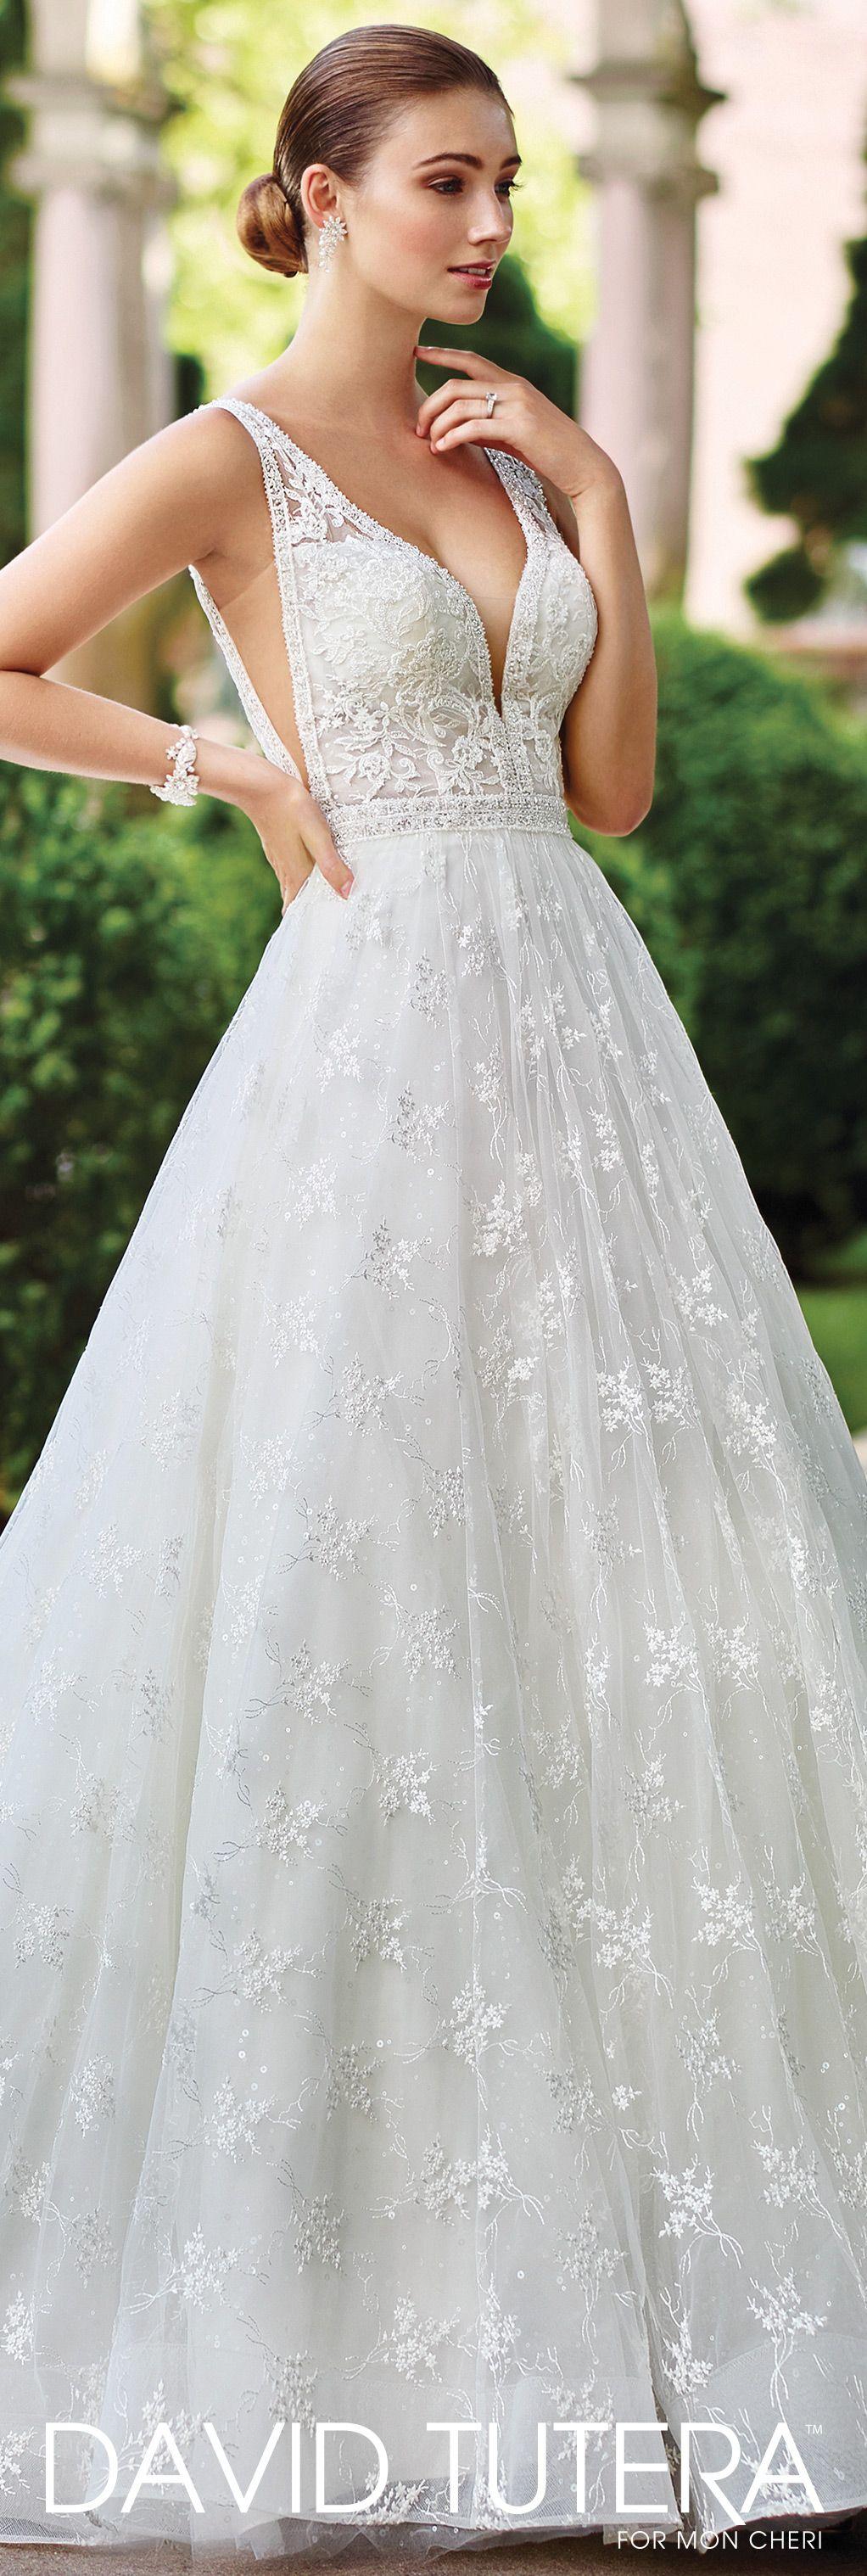 Sleeveless A-Line Gown Wedding Dress- 117271 Jin- David Tutera ...